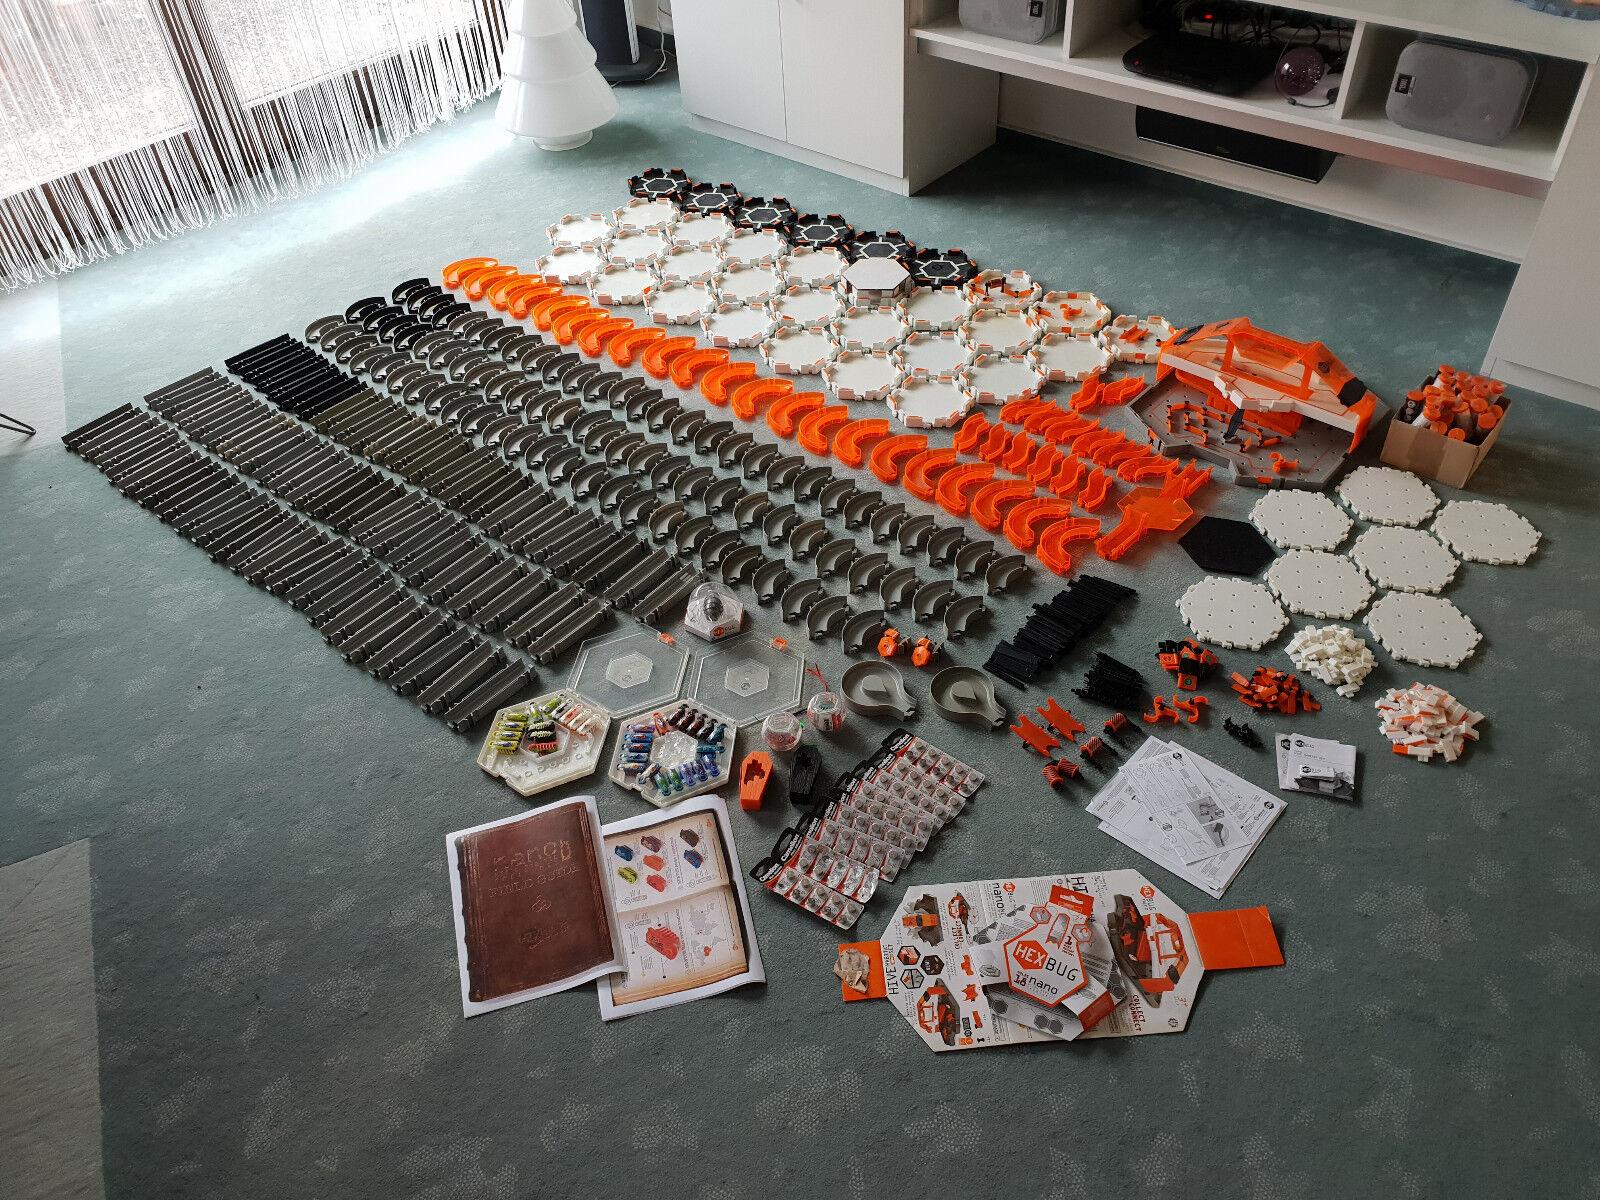 Hexbug Nano Mega XXL Paket mehrere x100 Teile Bahnteile, Seilbahn, Hive, Zubehör